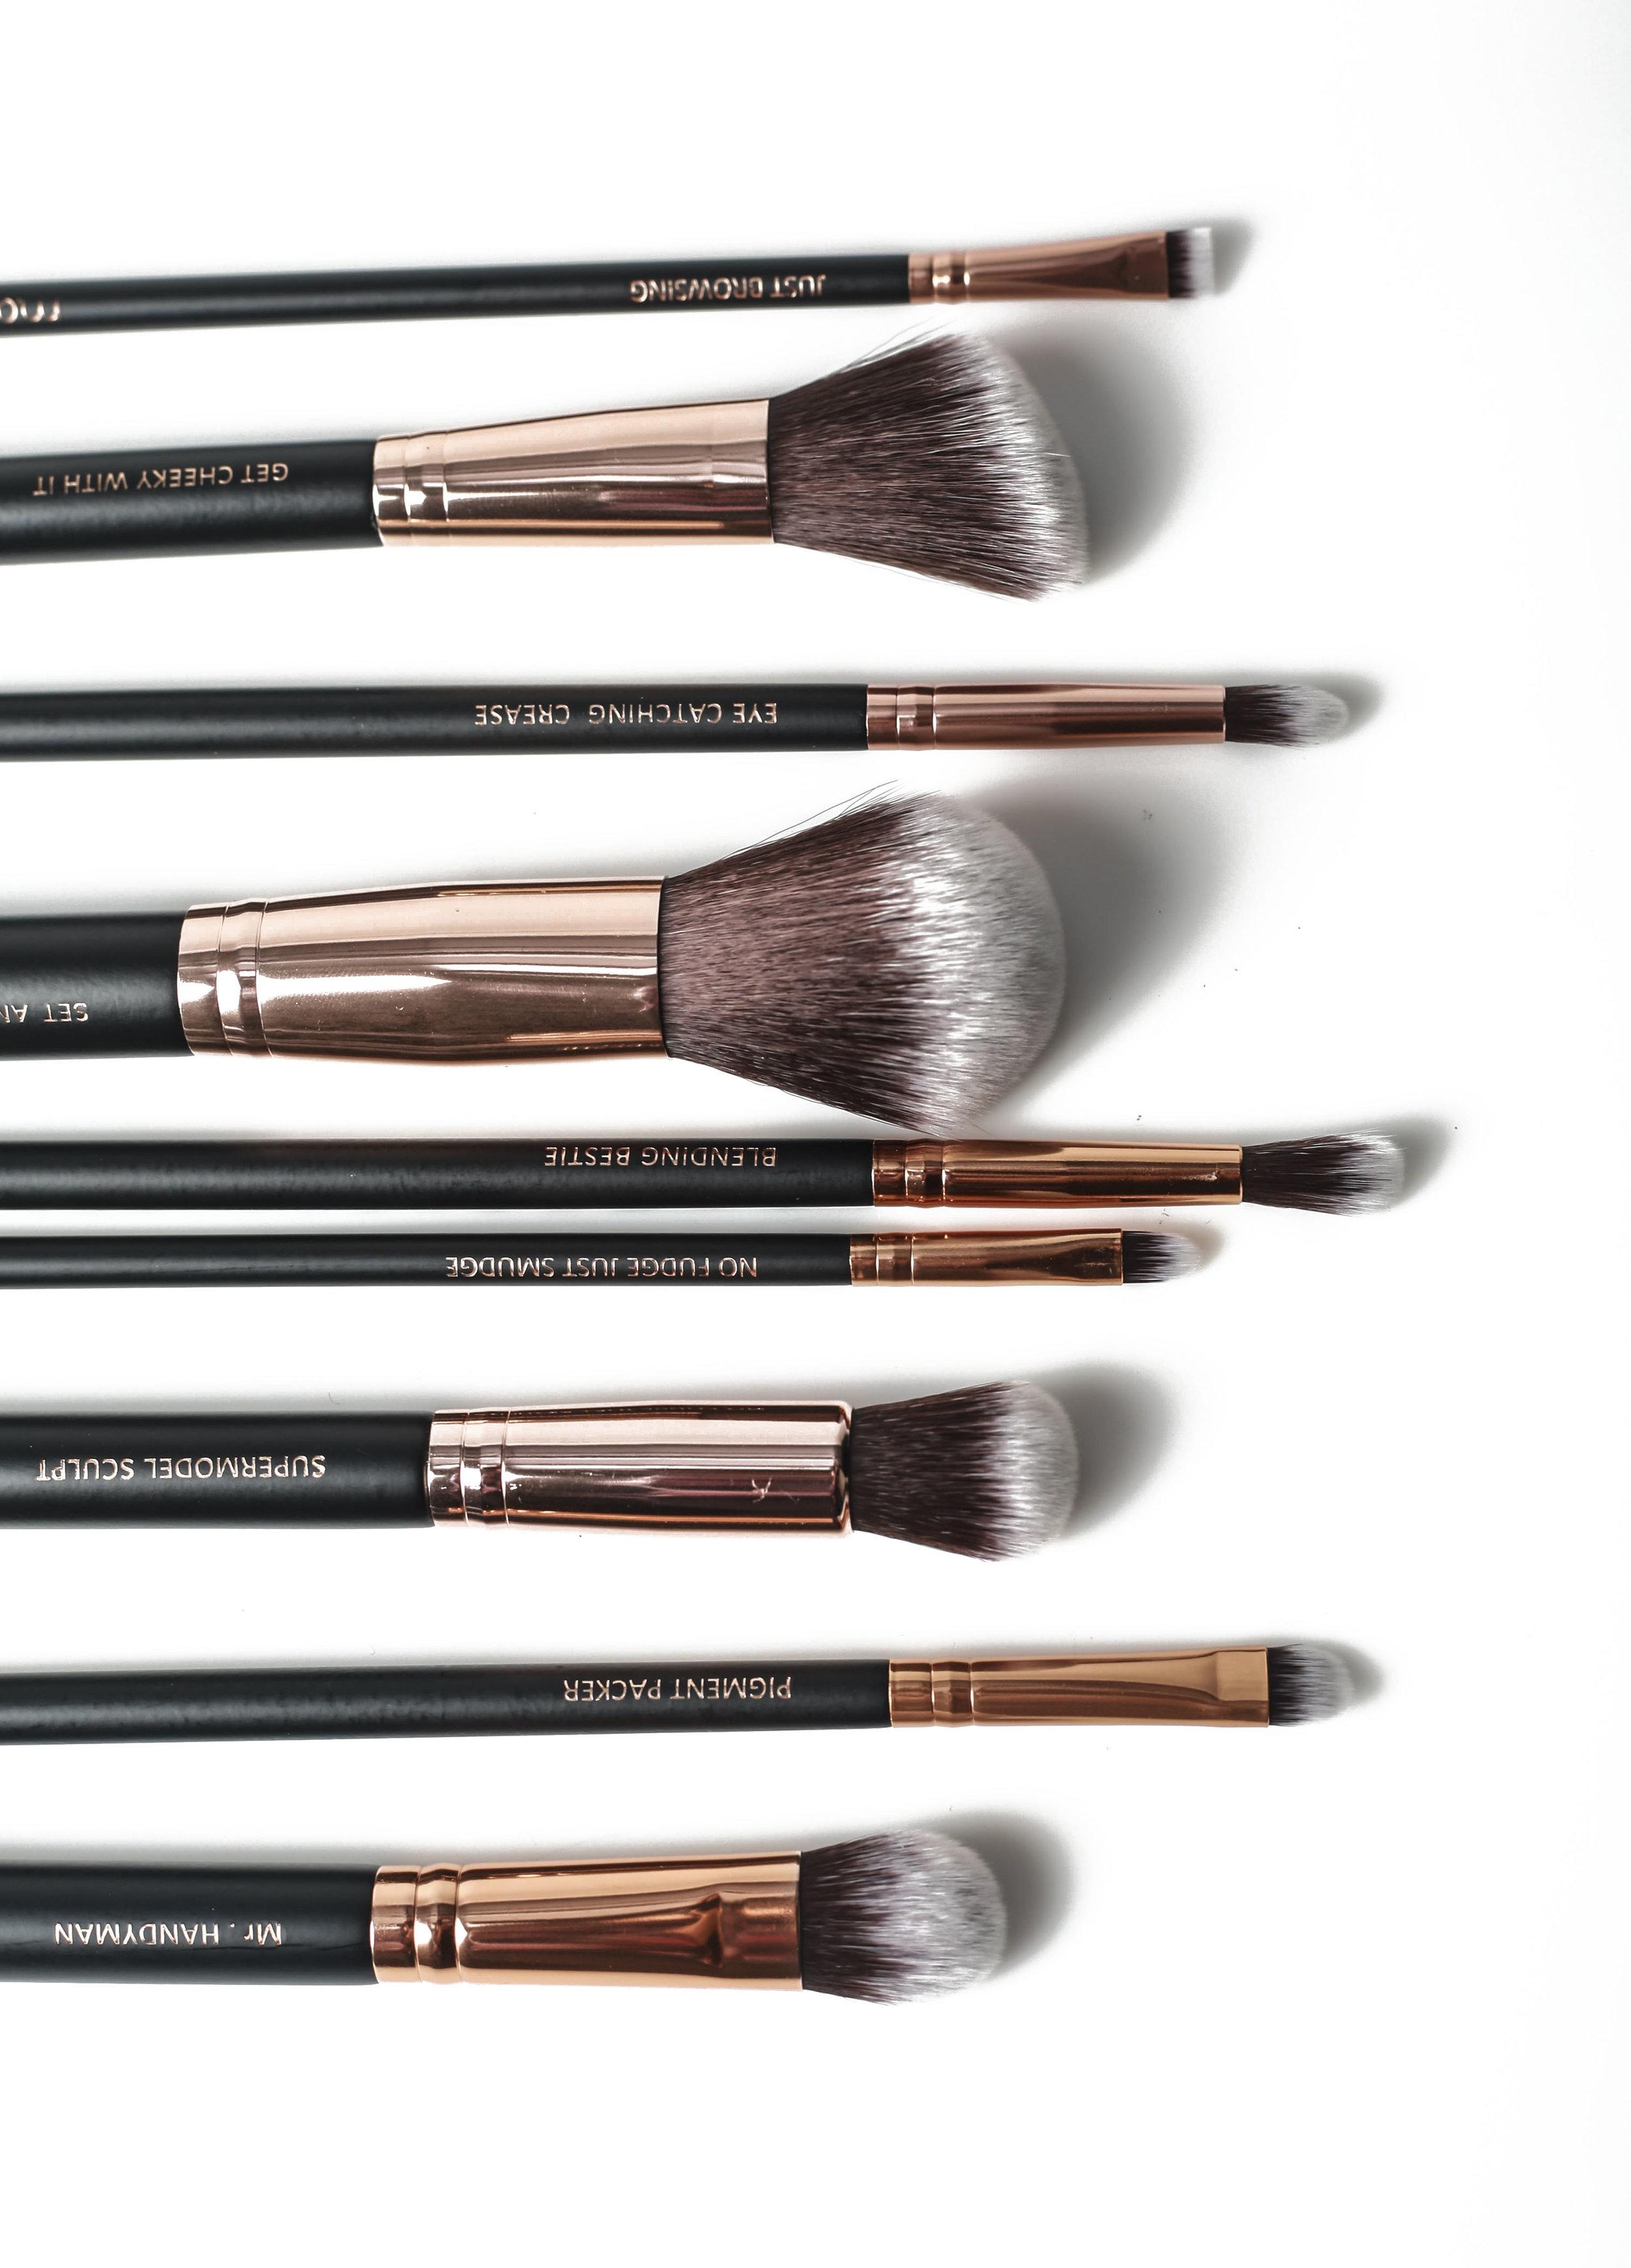 MOTD_Cosmetics-14.jpg